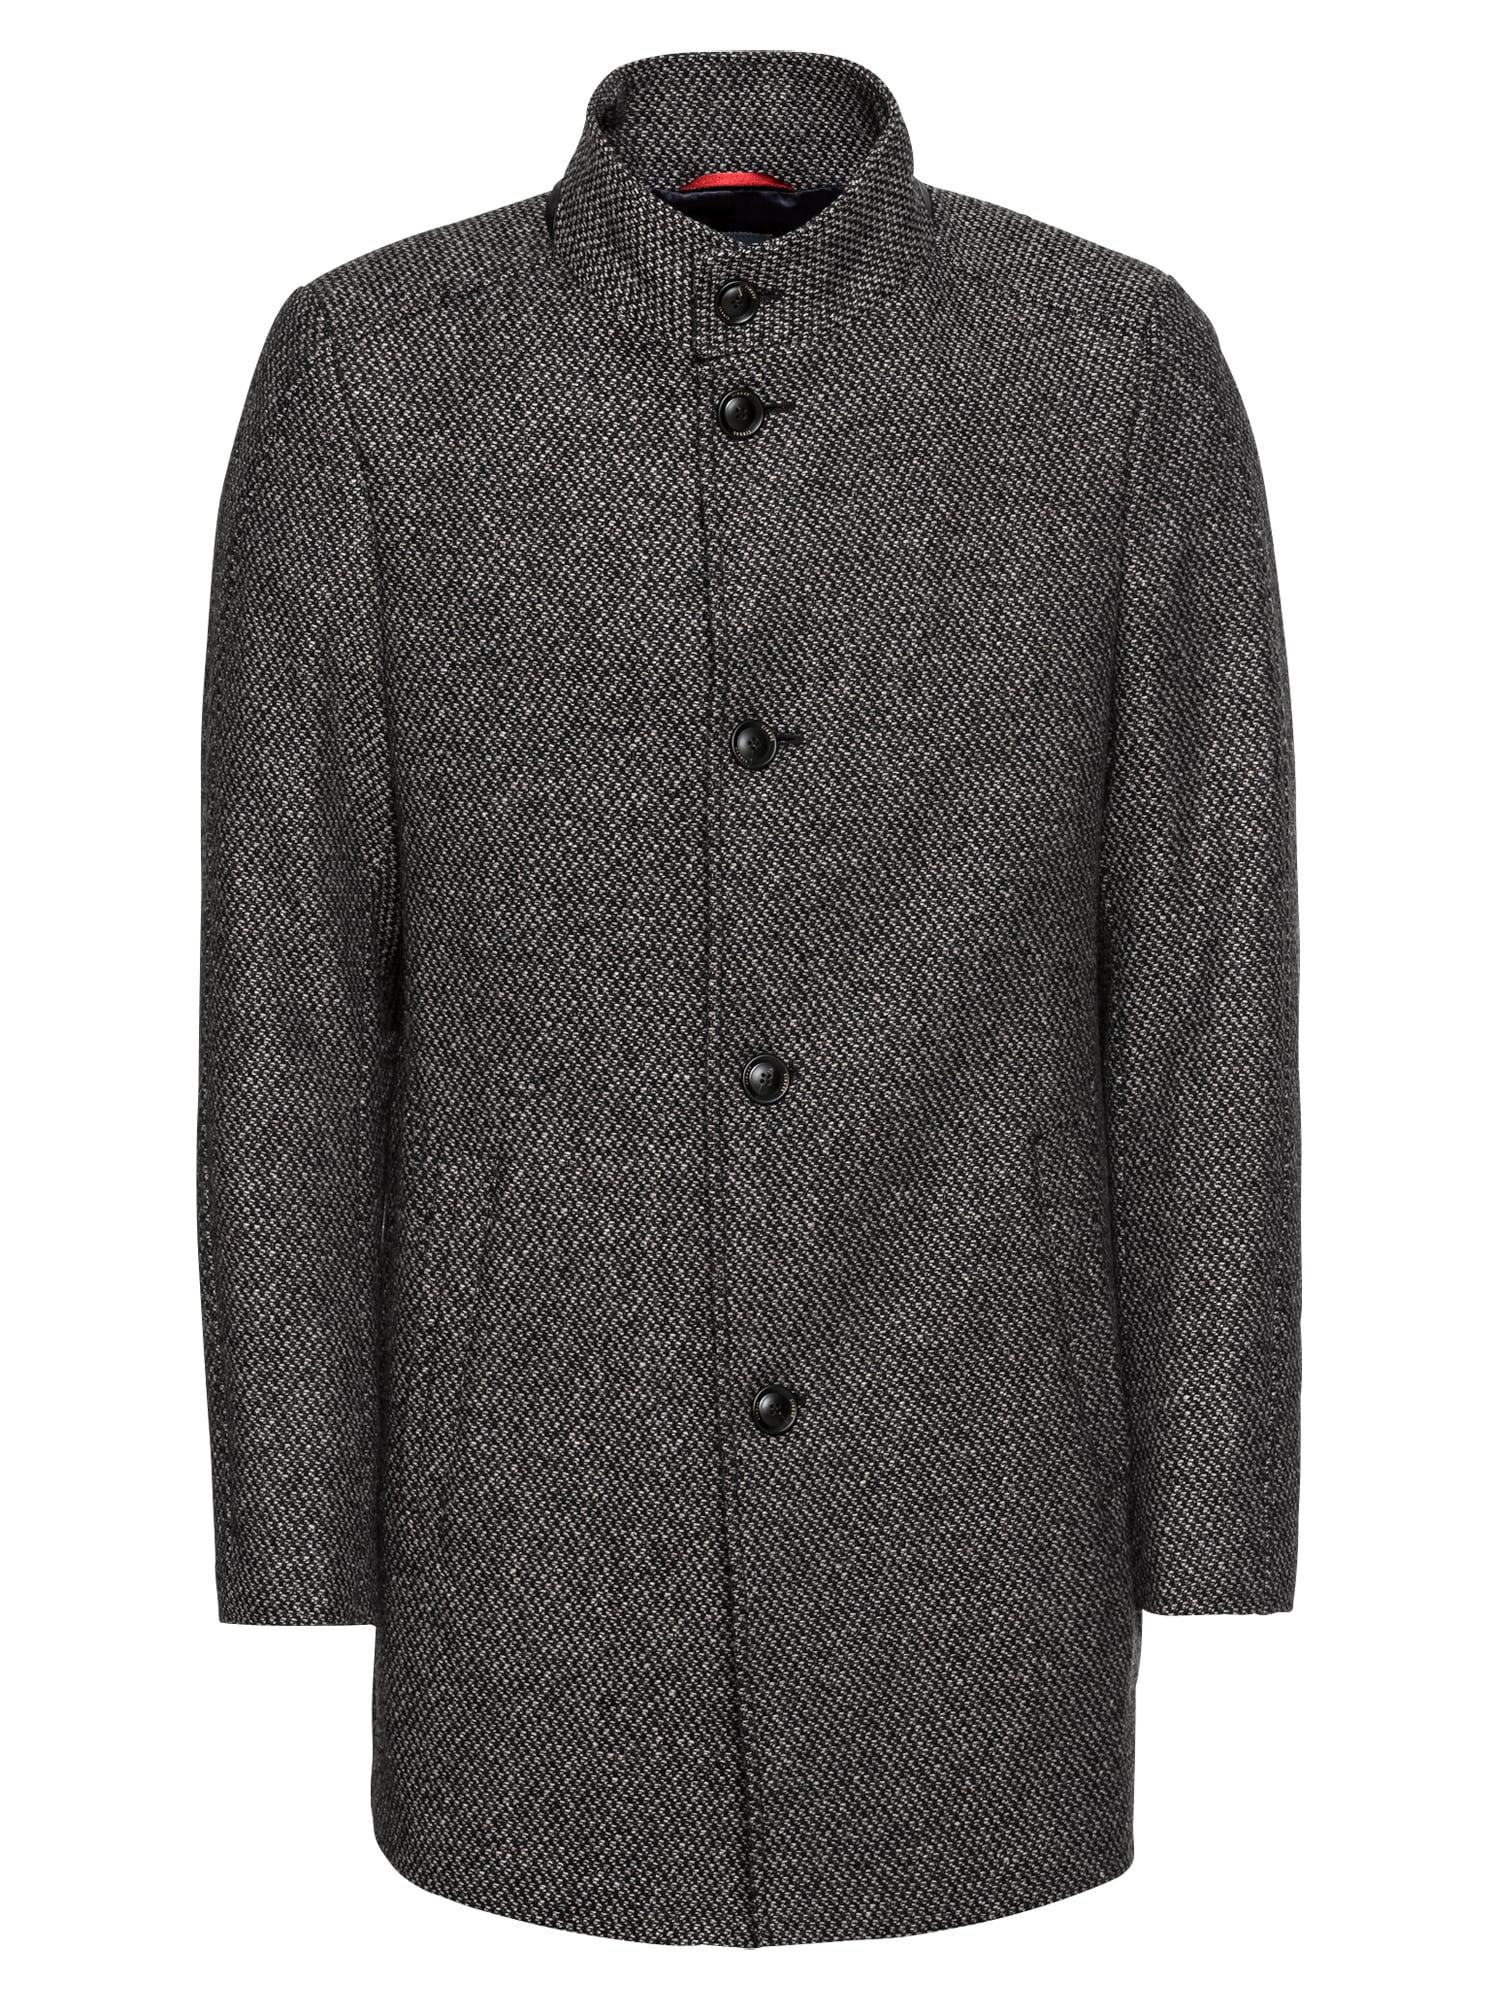 CINQUE Rudeninis-žieminis paltas 'Cioxford' tamsiai pilka